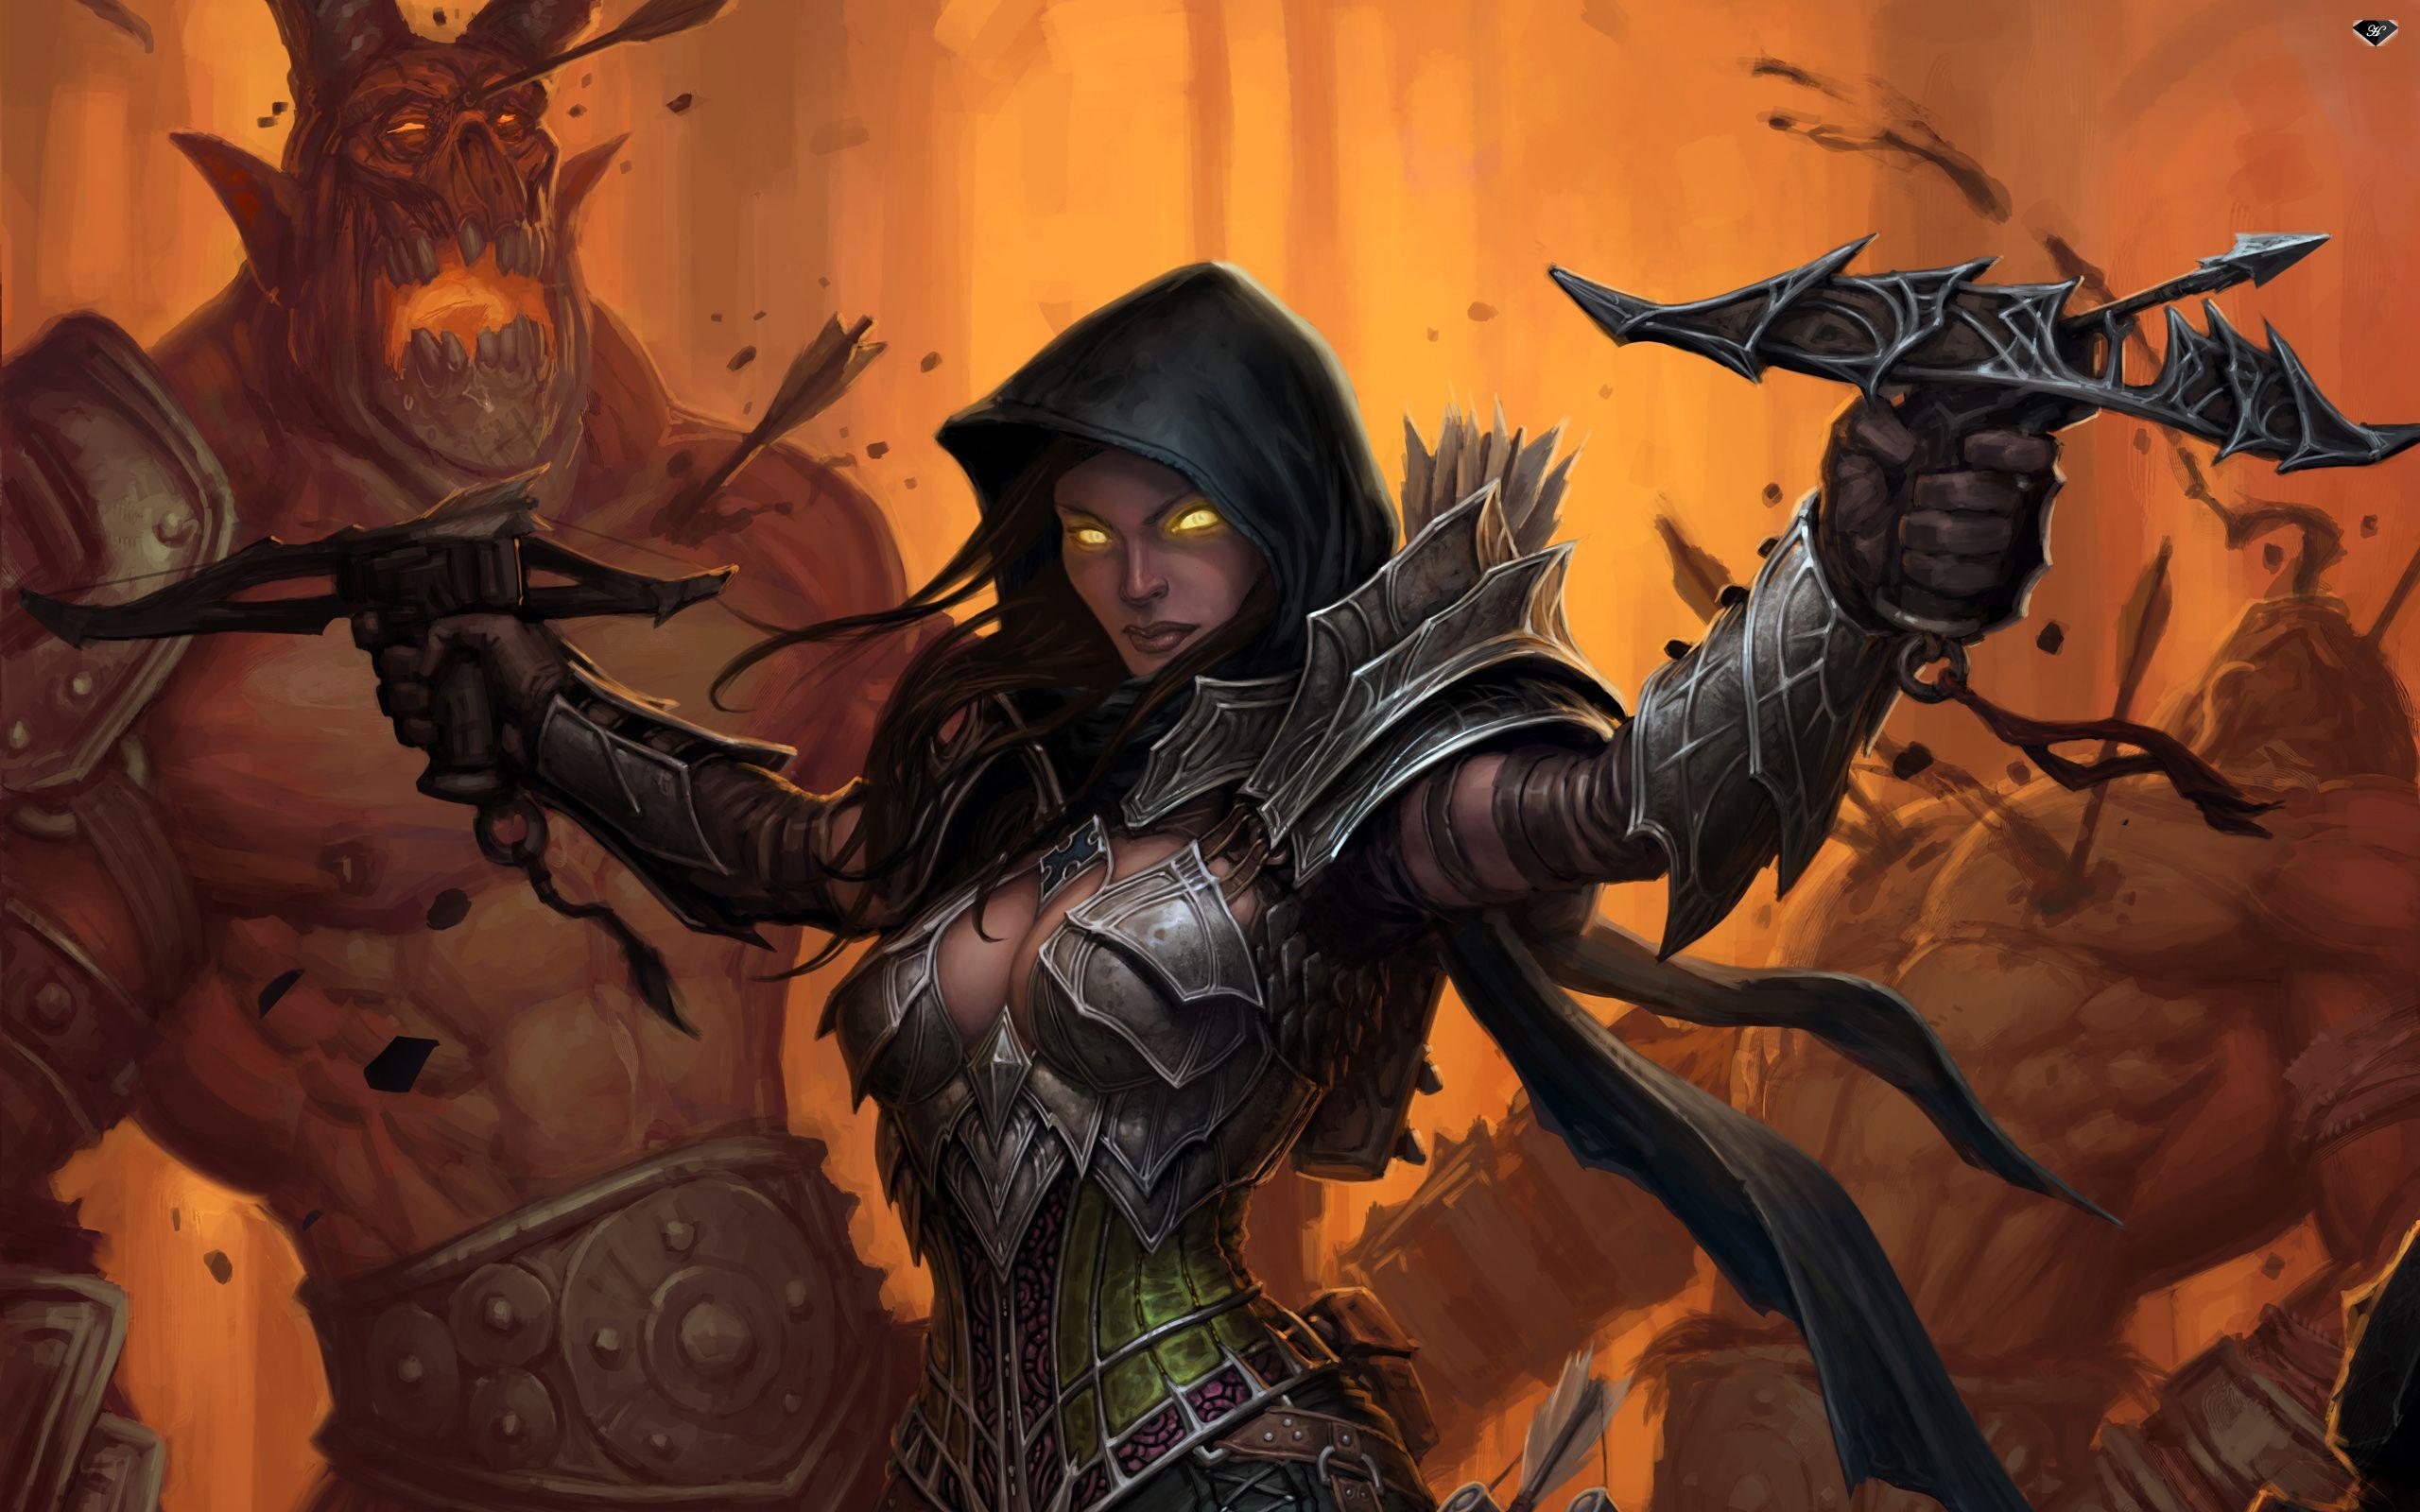 Pin by david on Characters: Fantasy   Demon hunter, Diablo 3, Hunter